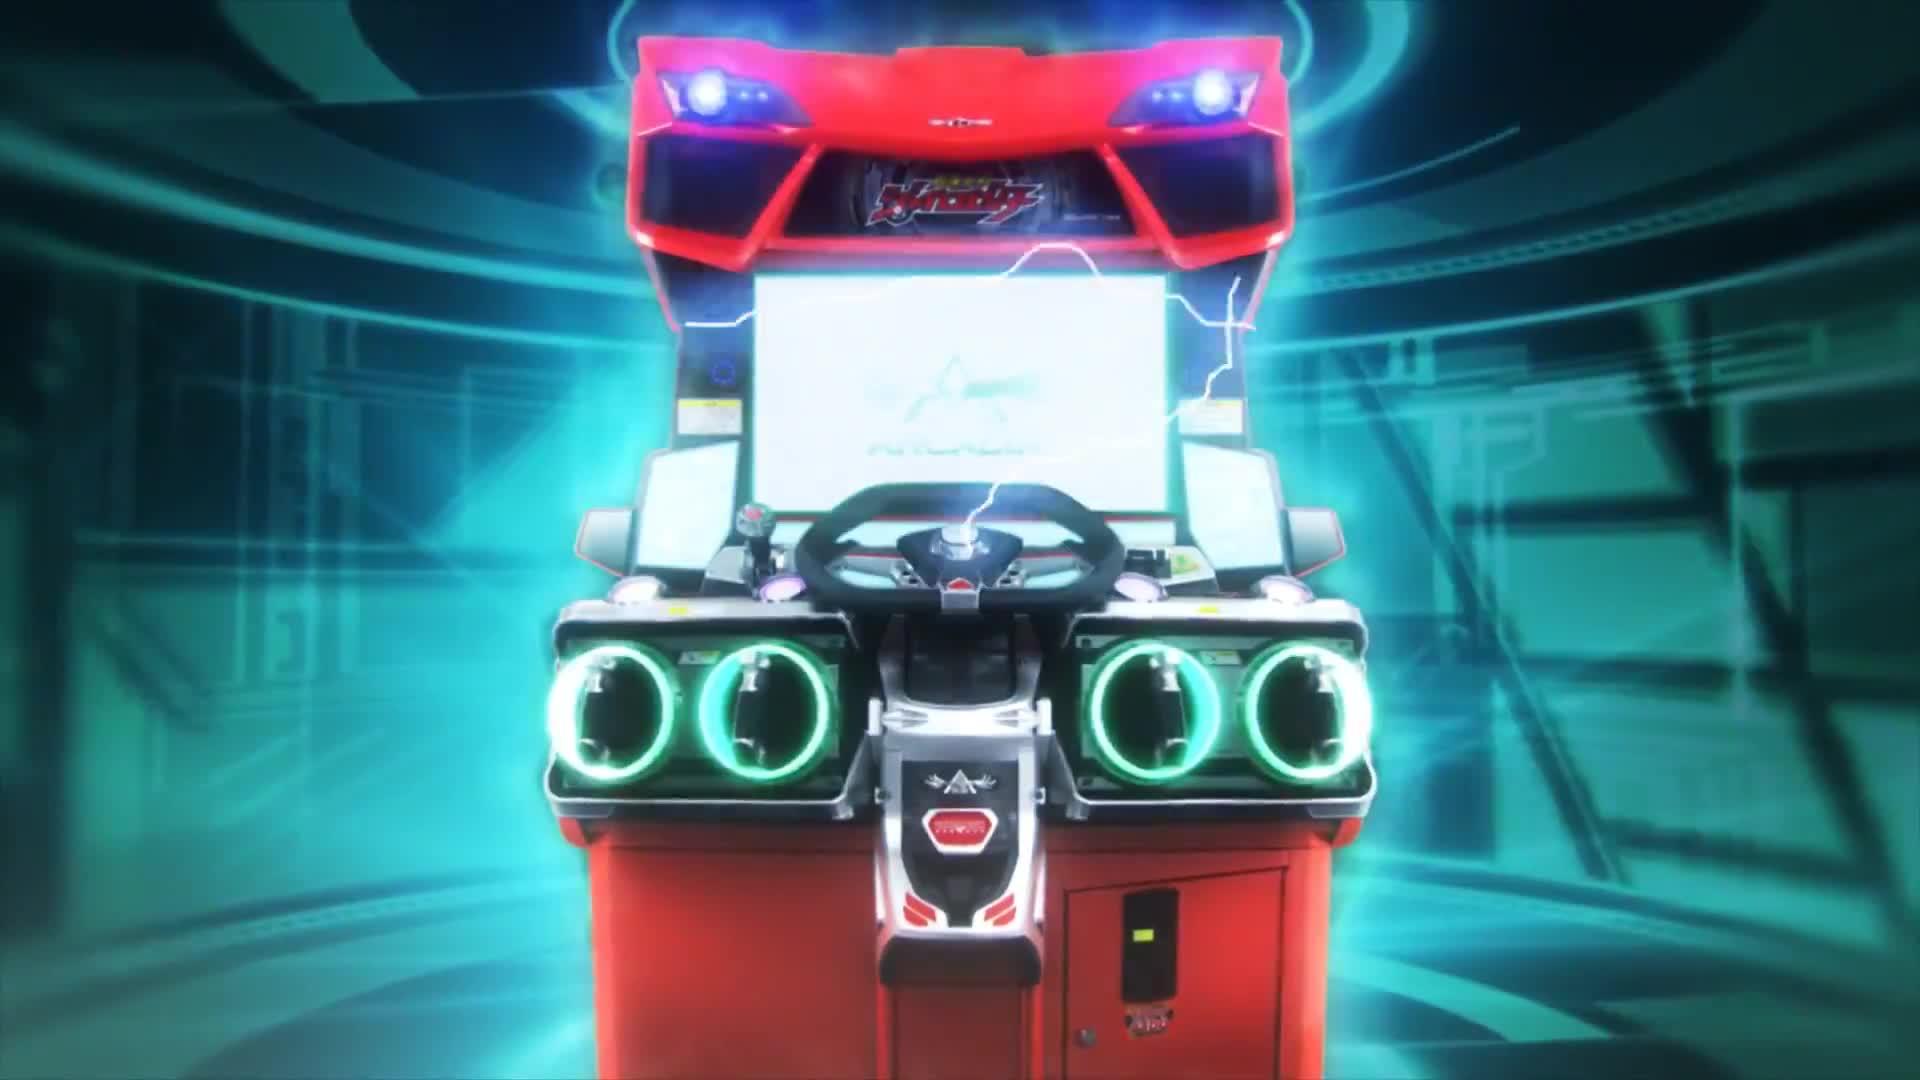 Chō, Henkei, asia, enix, gameplay, games, korea, kr, trailer, プロモーション映像01, Raibird Convoy chegando em estilo GIFs